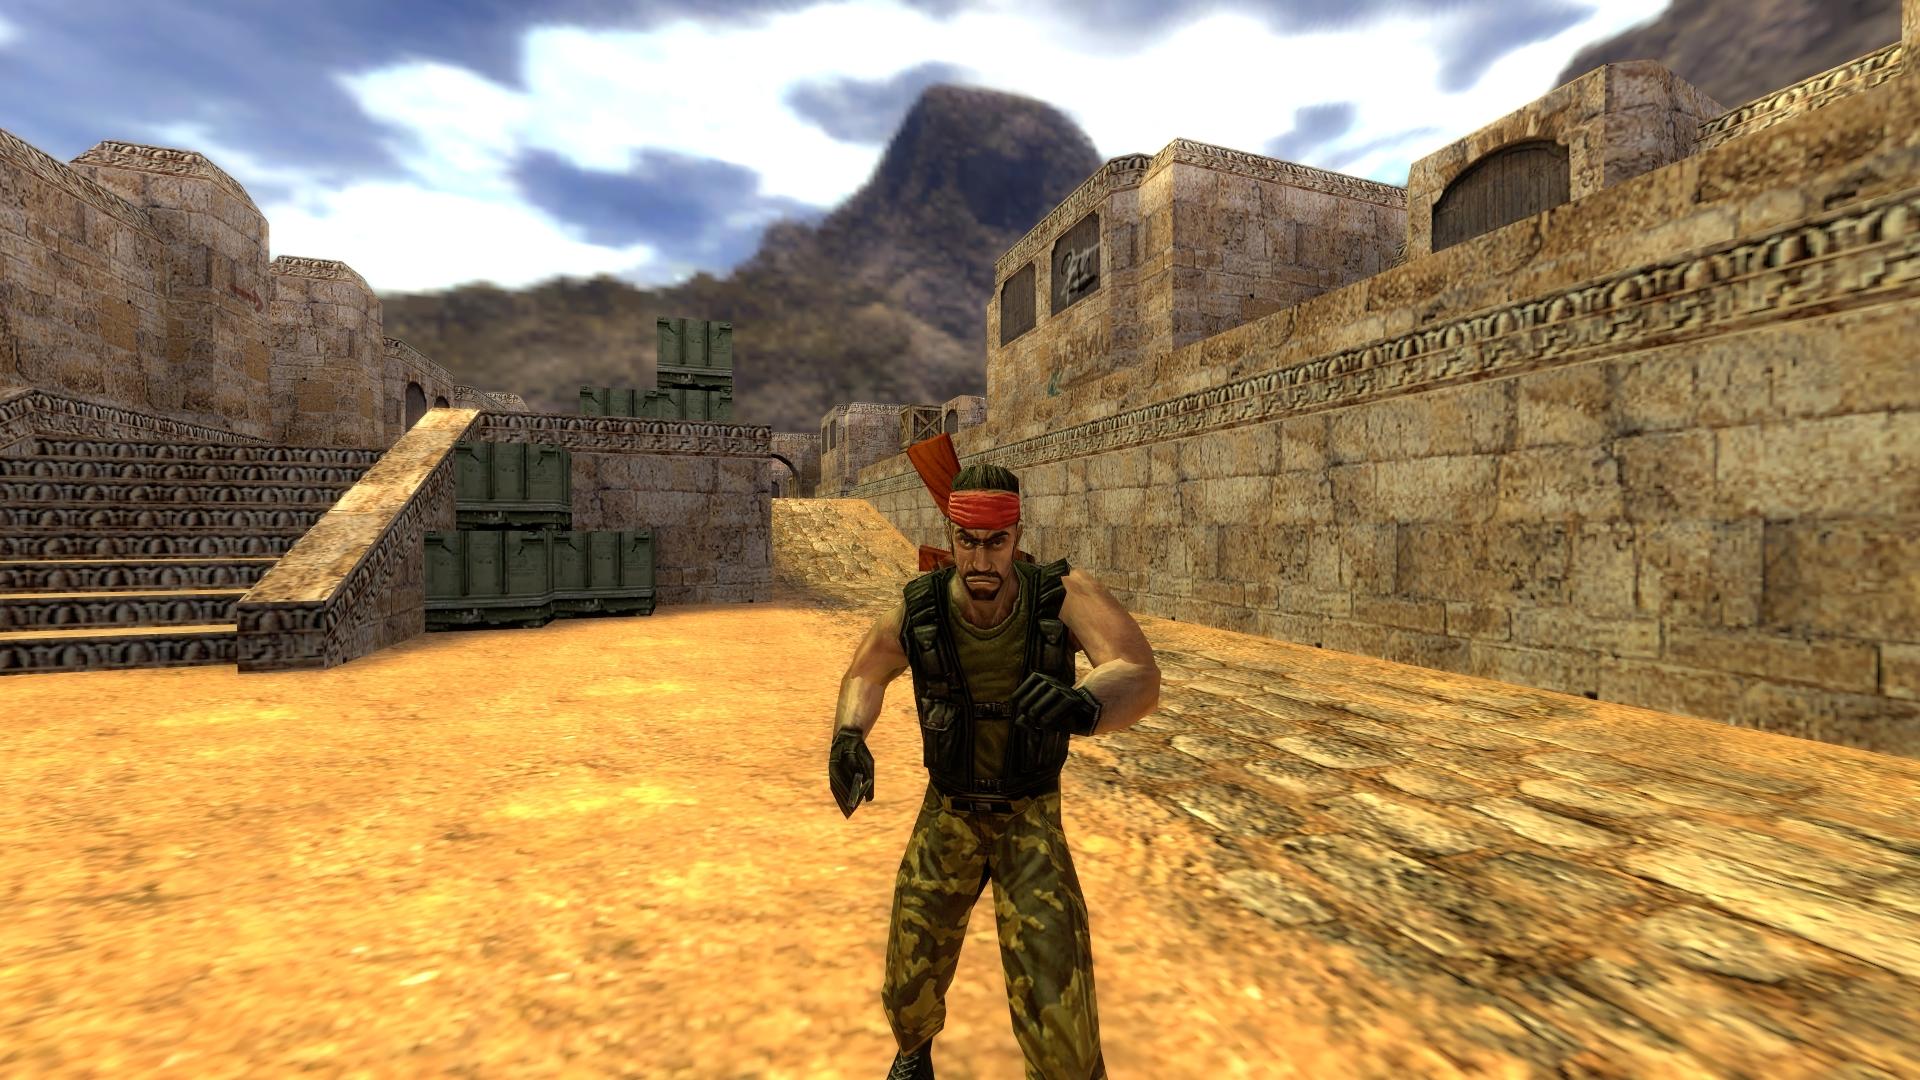 Player Models Image Counter Strike 1 6 Source Mod For Half Life 2